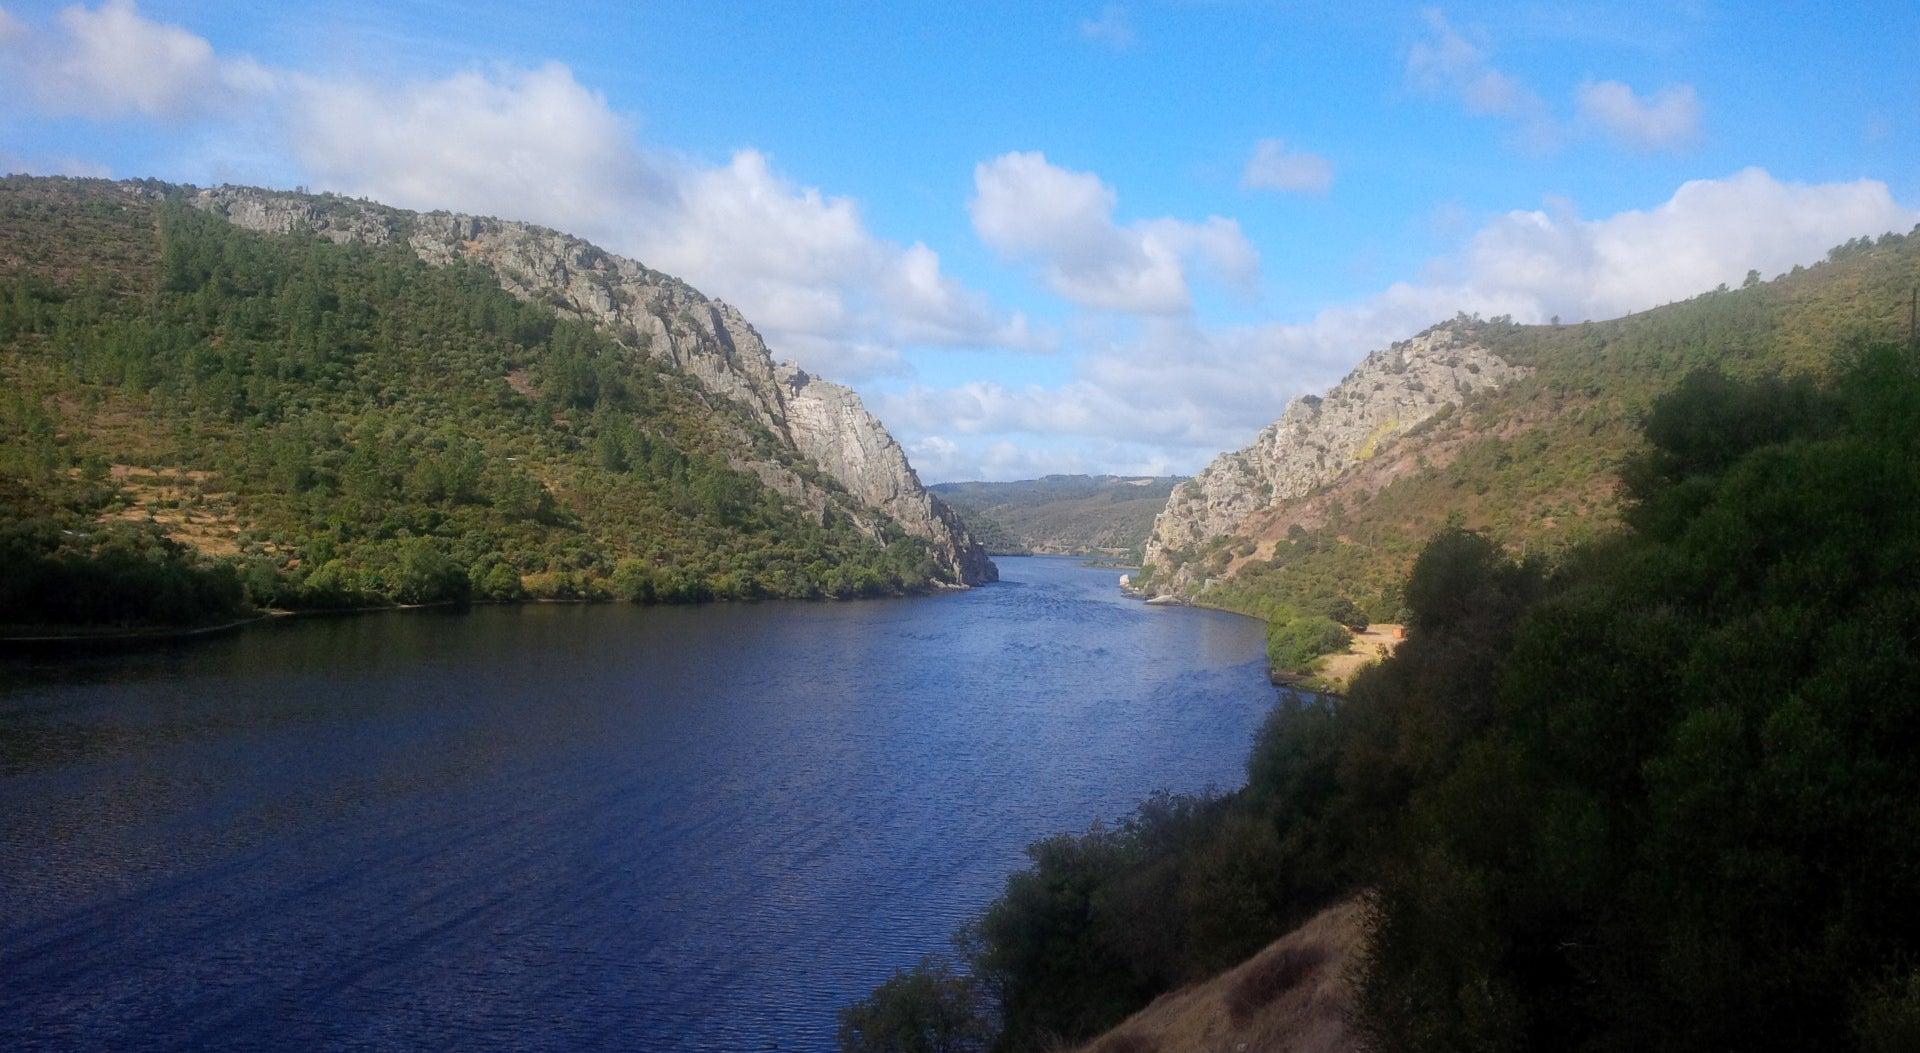 Tejo, o rio perdido